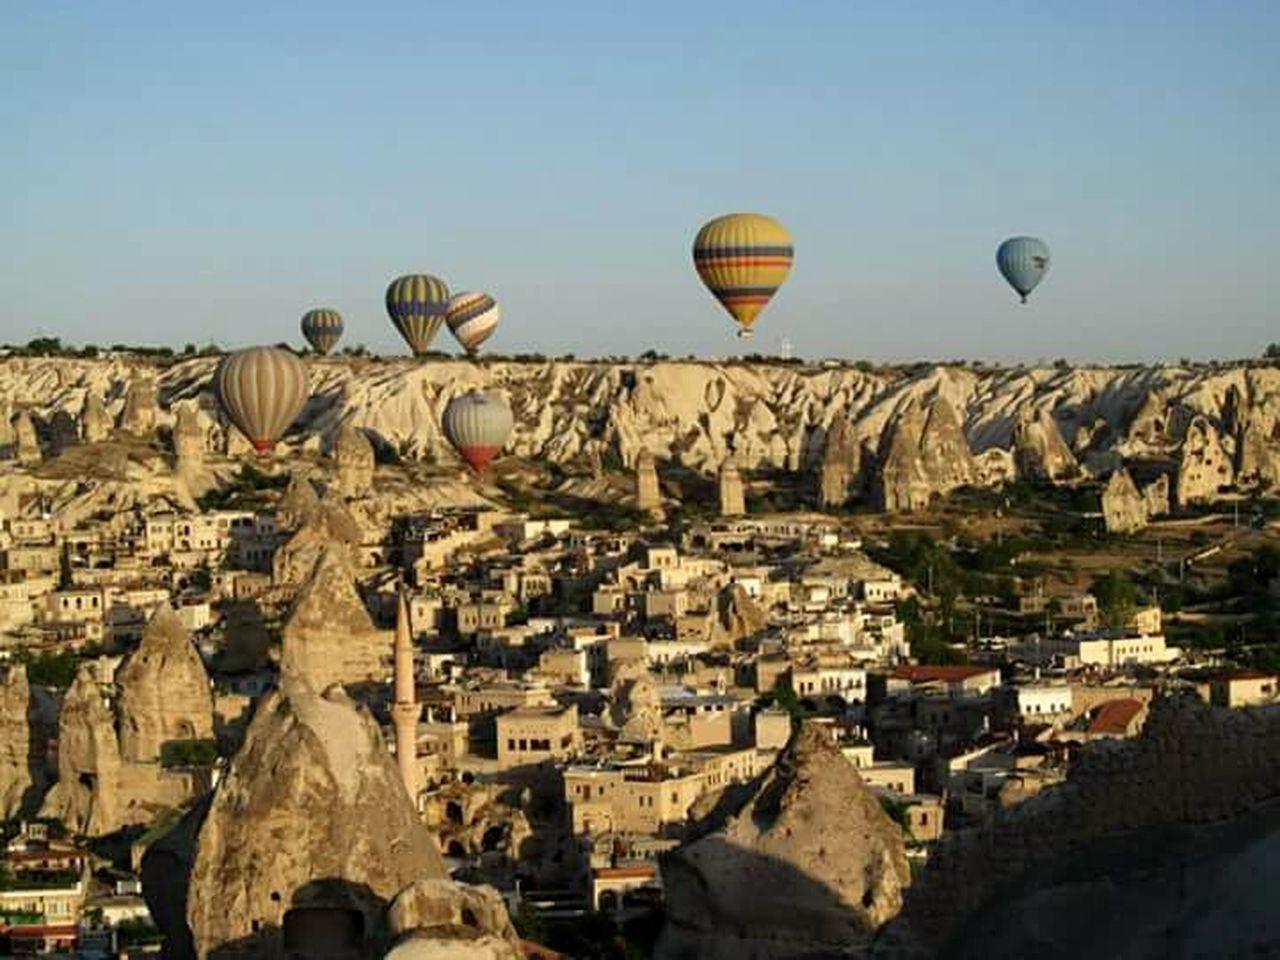 Kapadokya Kapadokyaballoons Baloons Awsomenature Oldsity On The Road Feel The Journey